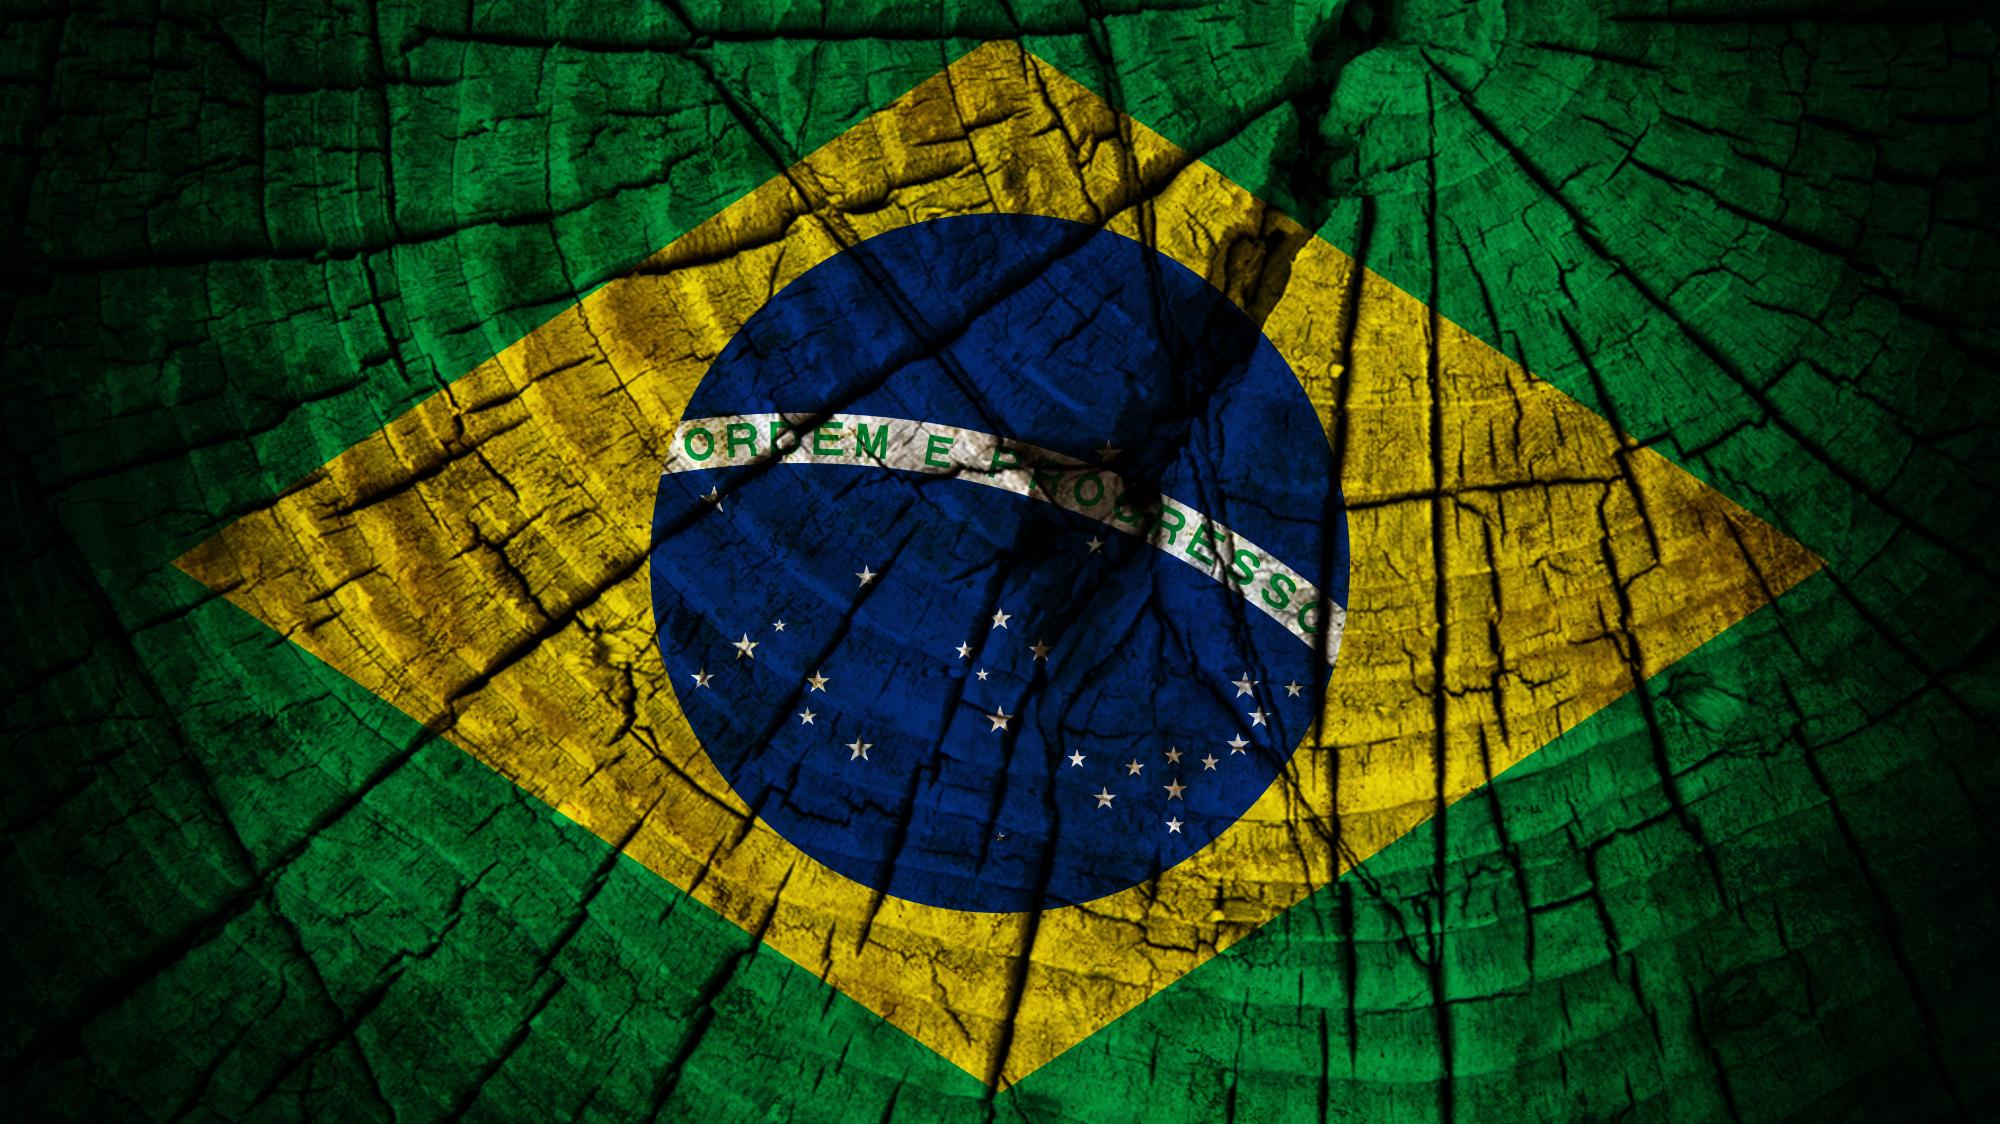 Brazil wallpaper hd pixelstalk paradise on brazil rio de janeiro brazil wallpaper hd pixelstalk paradise on brazil rio de janeiro wallpaper desktop pc 2000x1124 voltagebd Choice Image